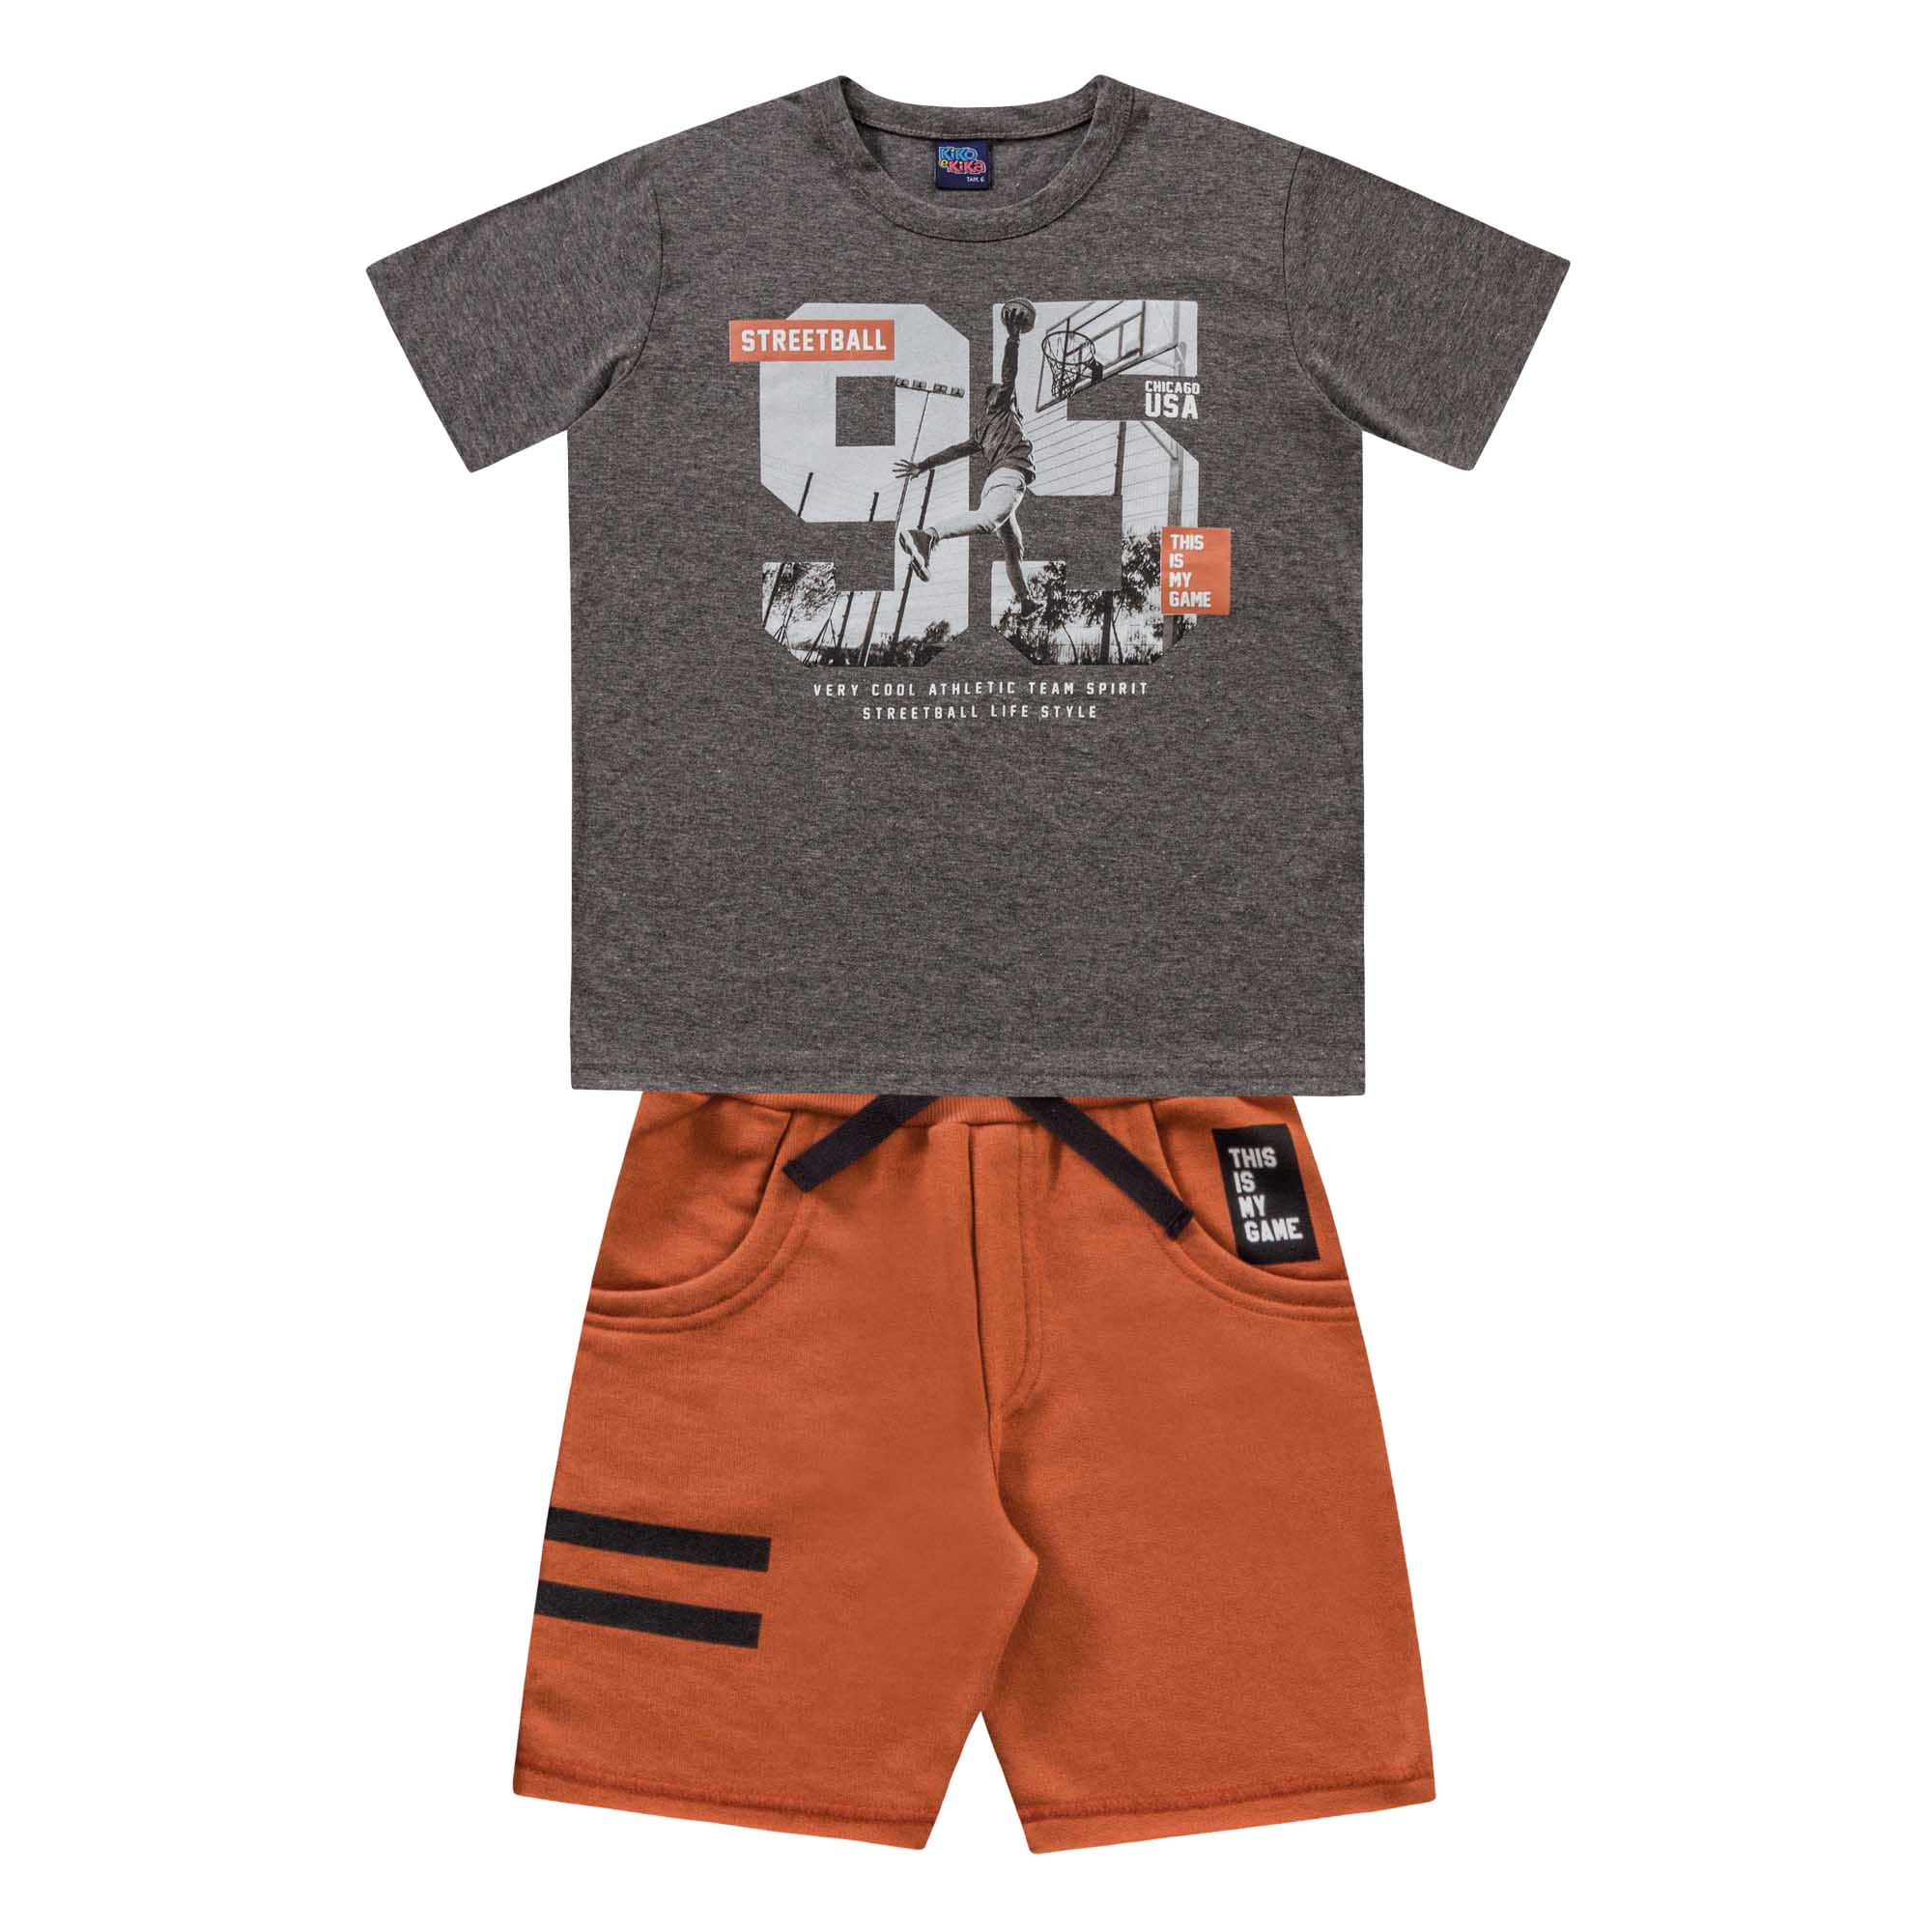 Conjunto Verão Kiko e Kika Camiseta e Bermuda 95 - 6 ao 10